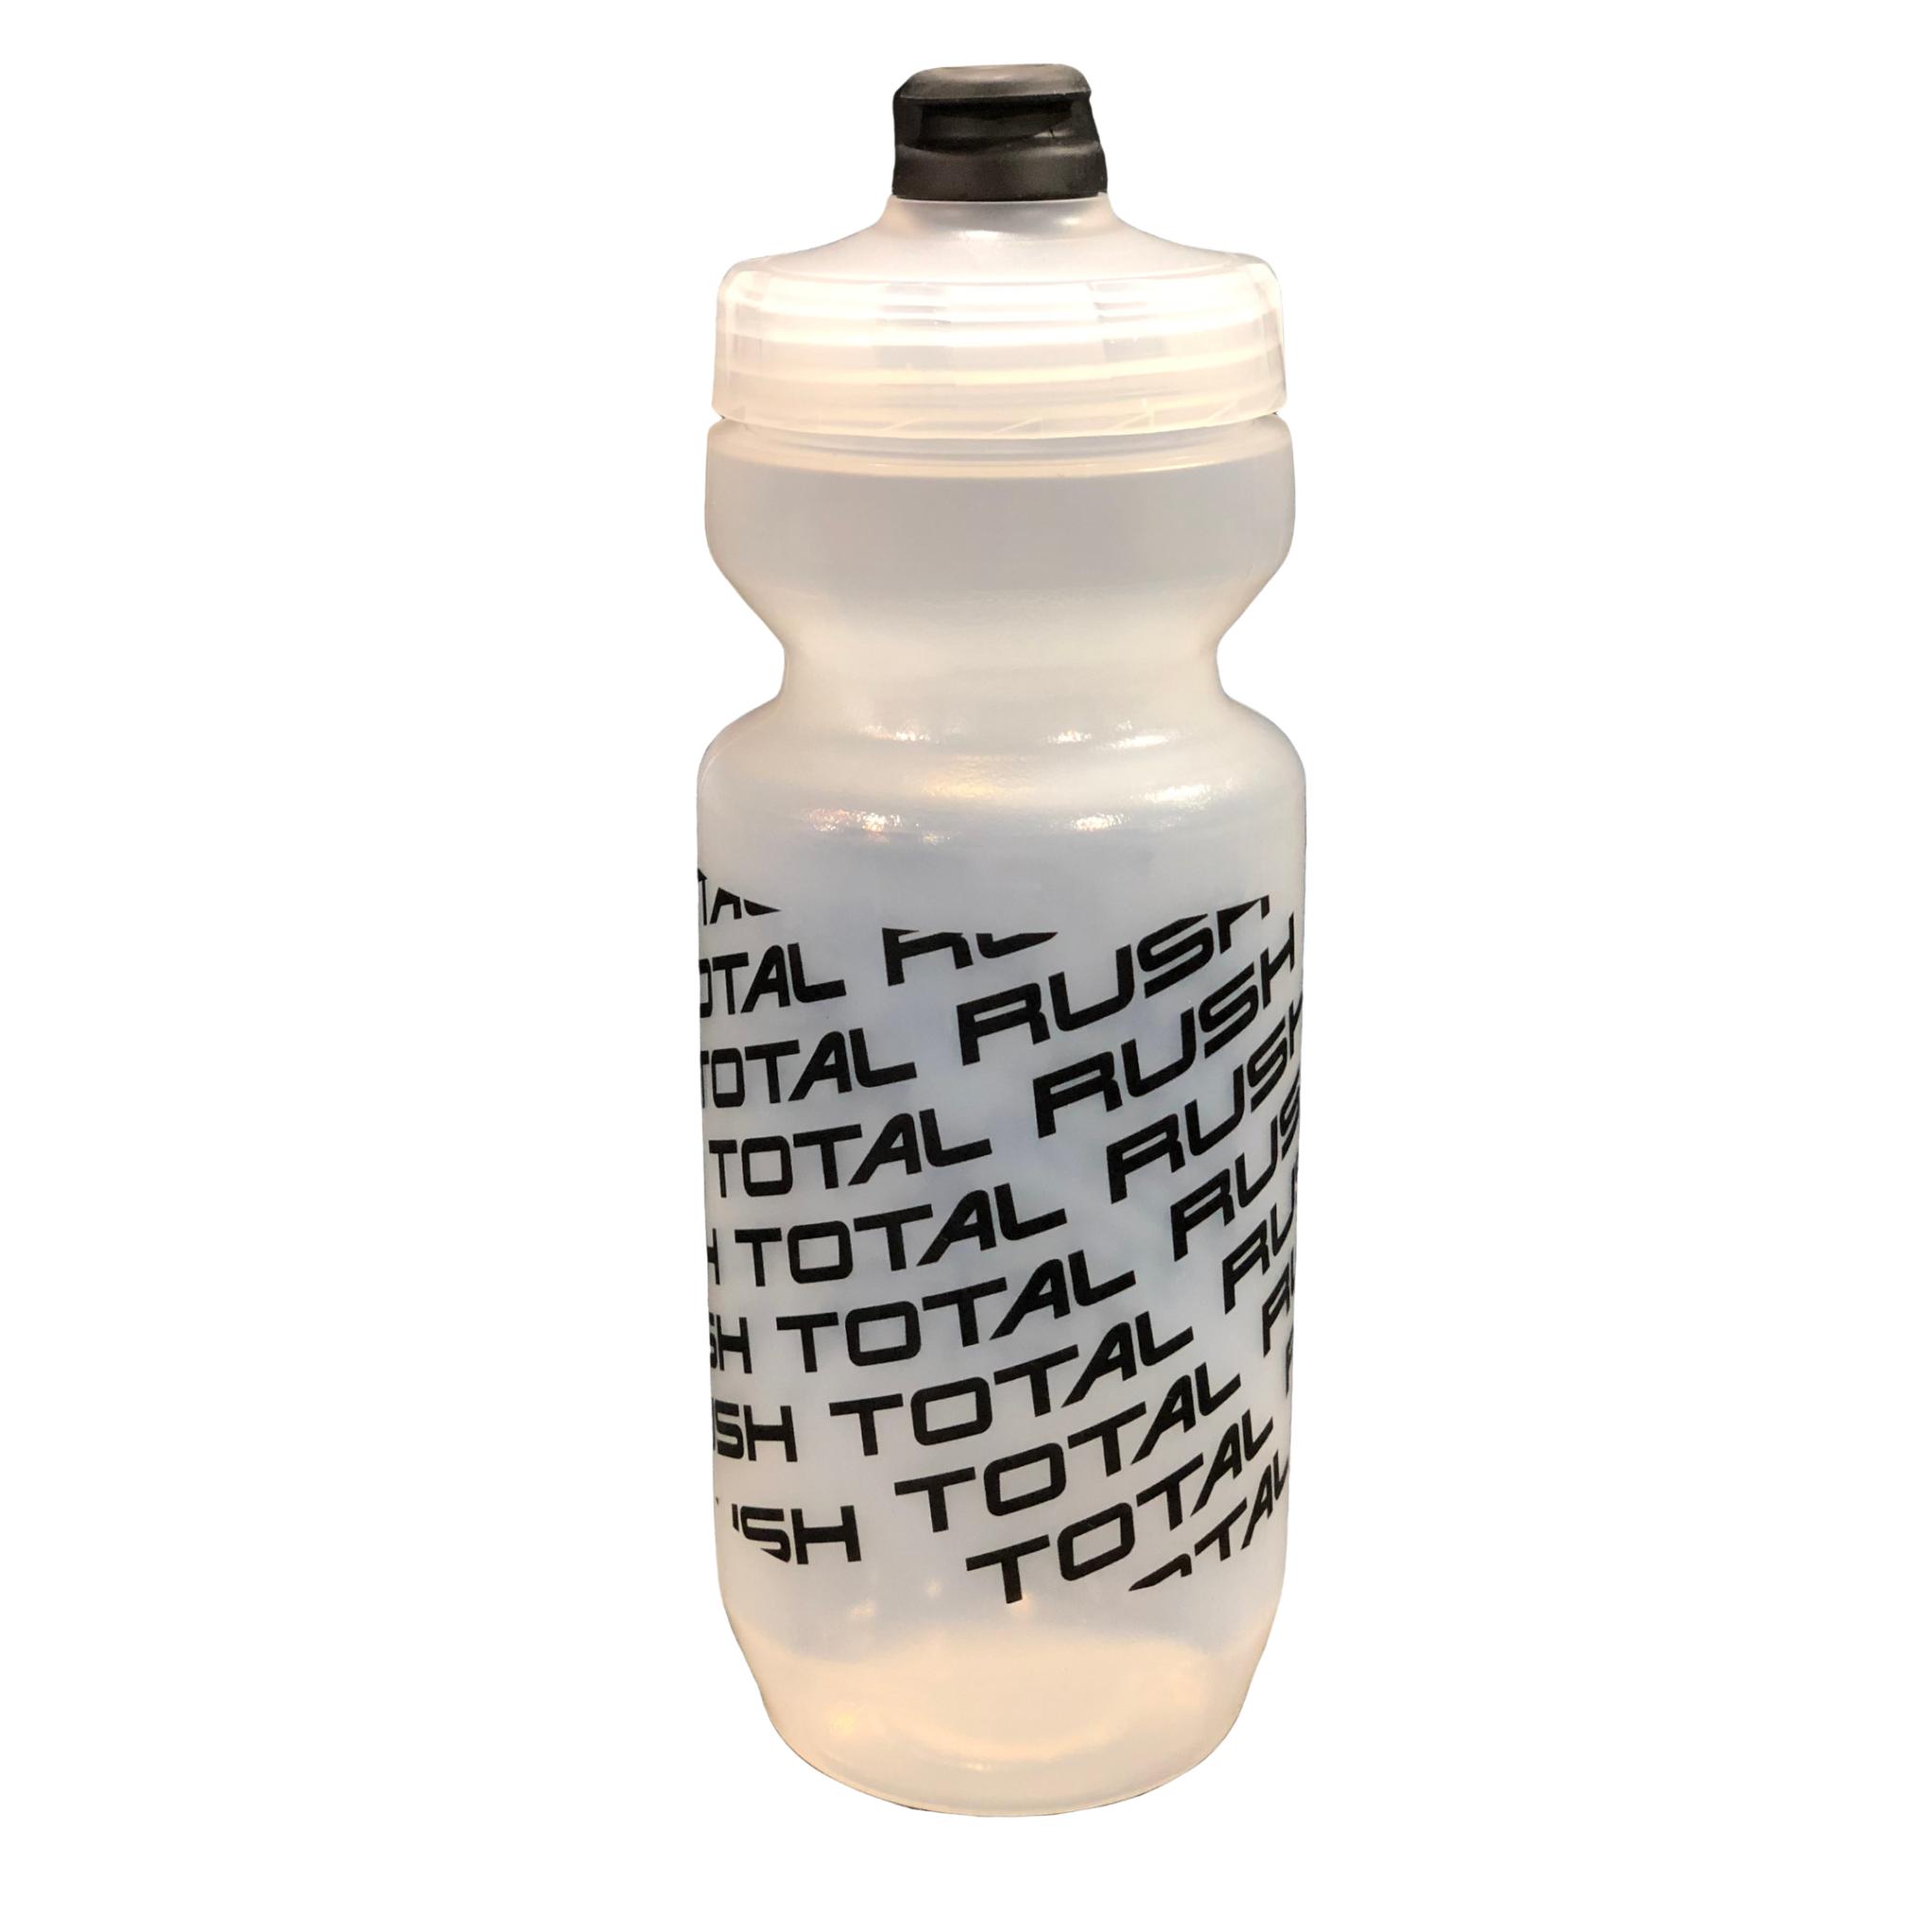 Purist Bottle 22oz Total Rush Black Wrap Logo